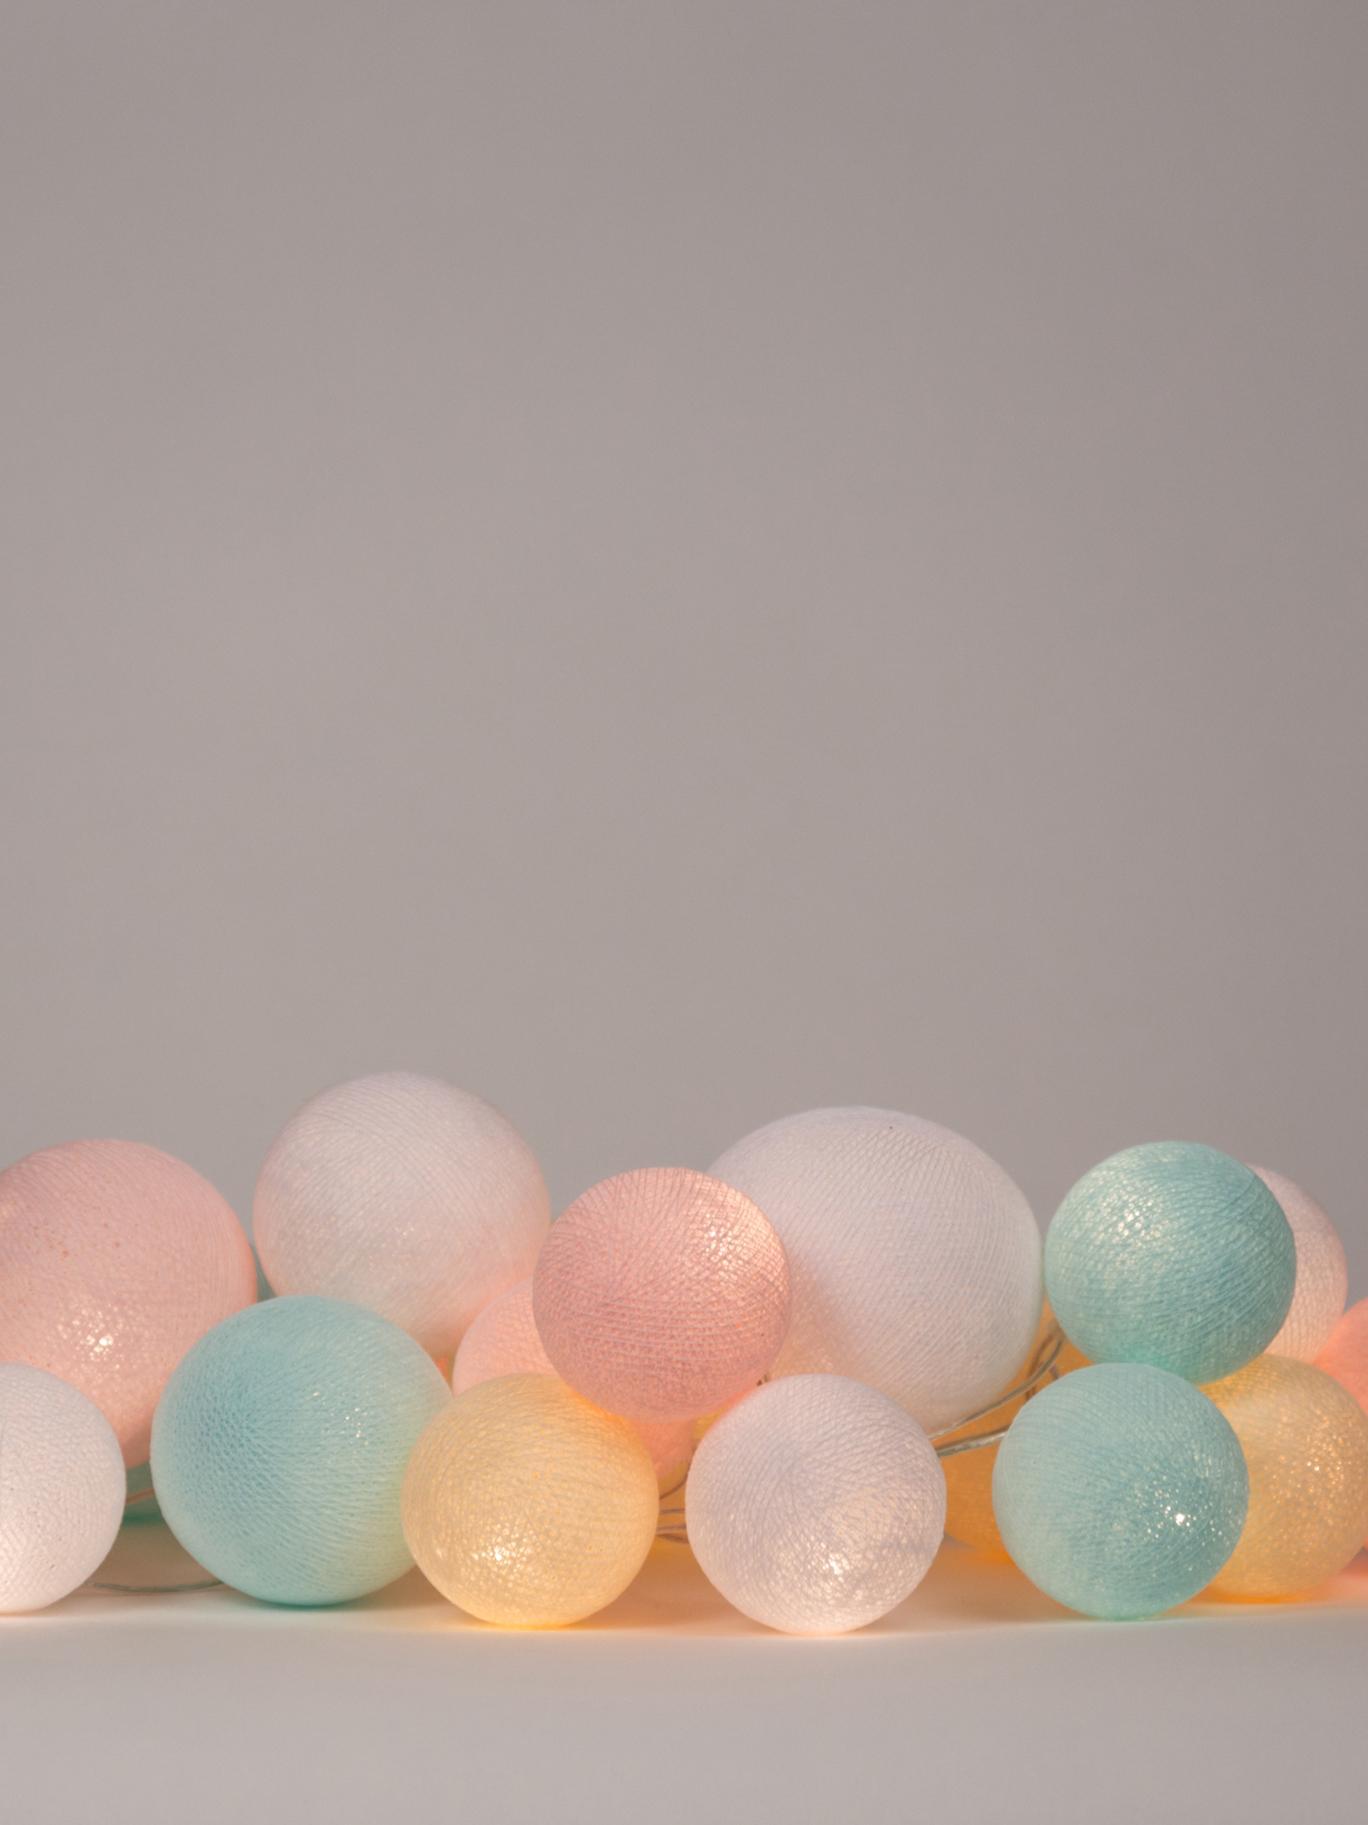 LED Lichterkette Moodi, Lampions: Polyester, Rosa, Blau, Beige, Weiß, L 264 cm